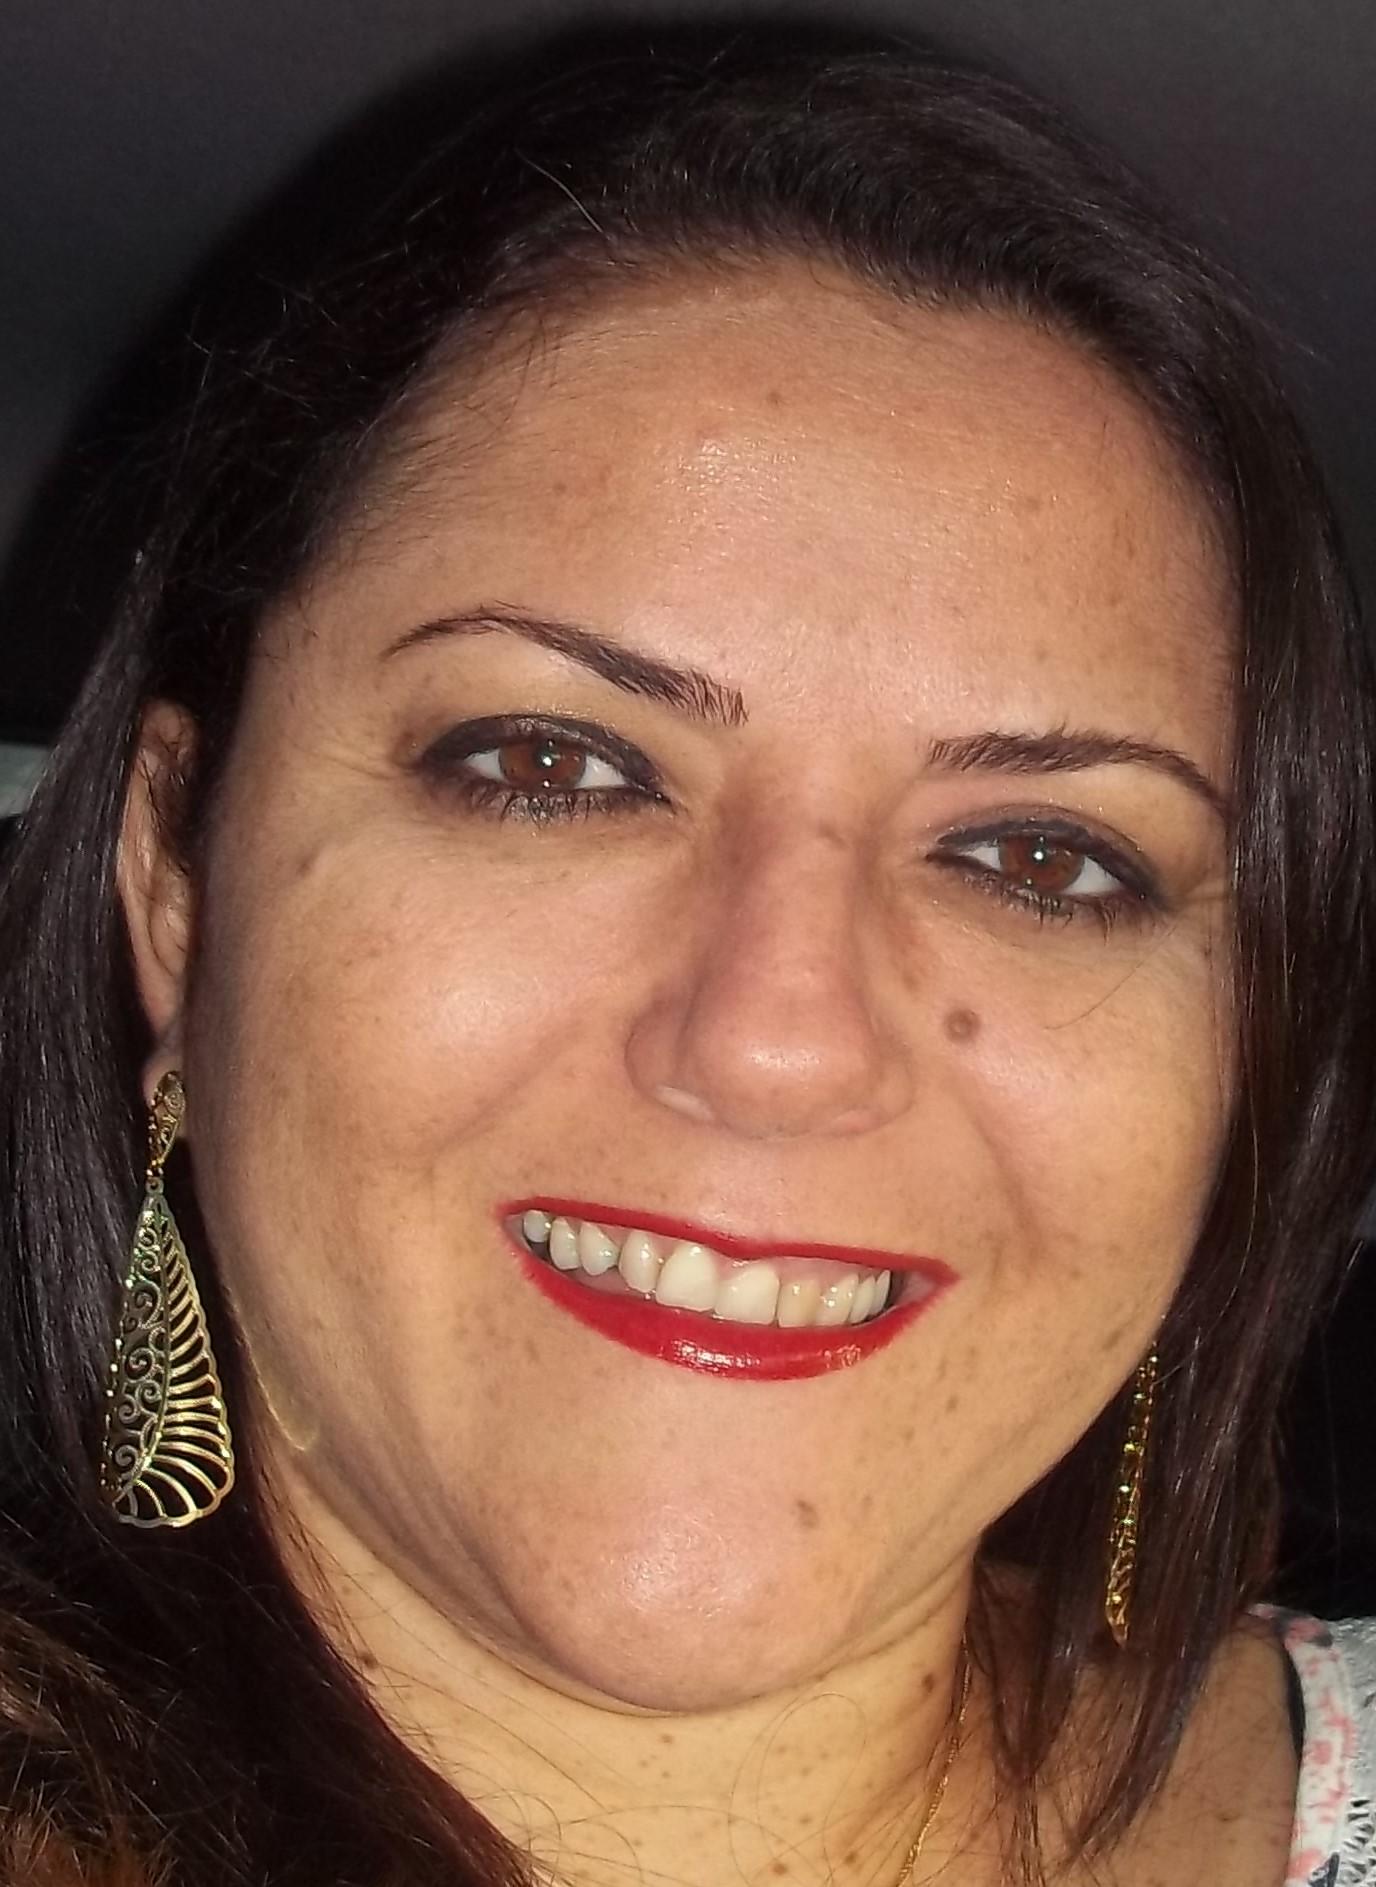 Ana Maria Silva Sobreira